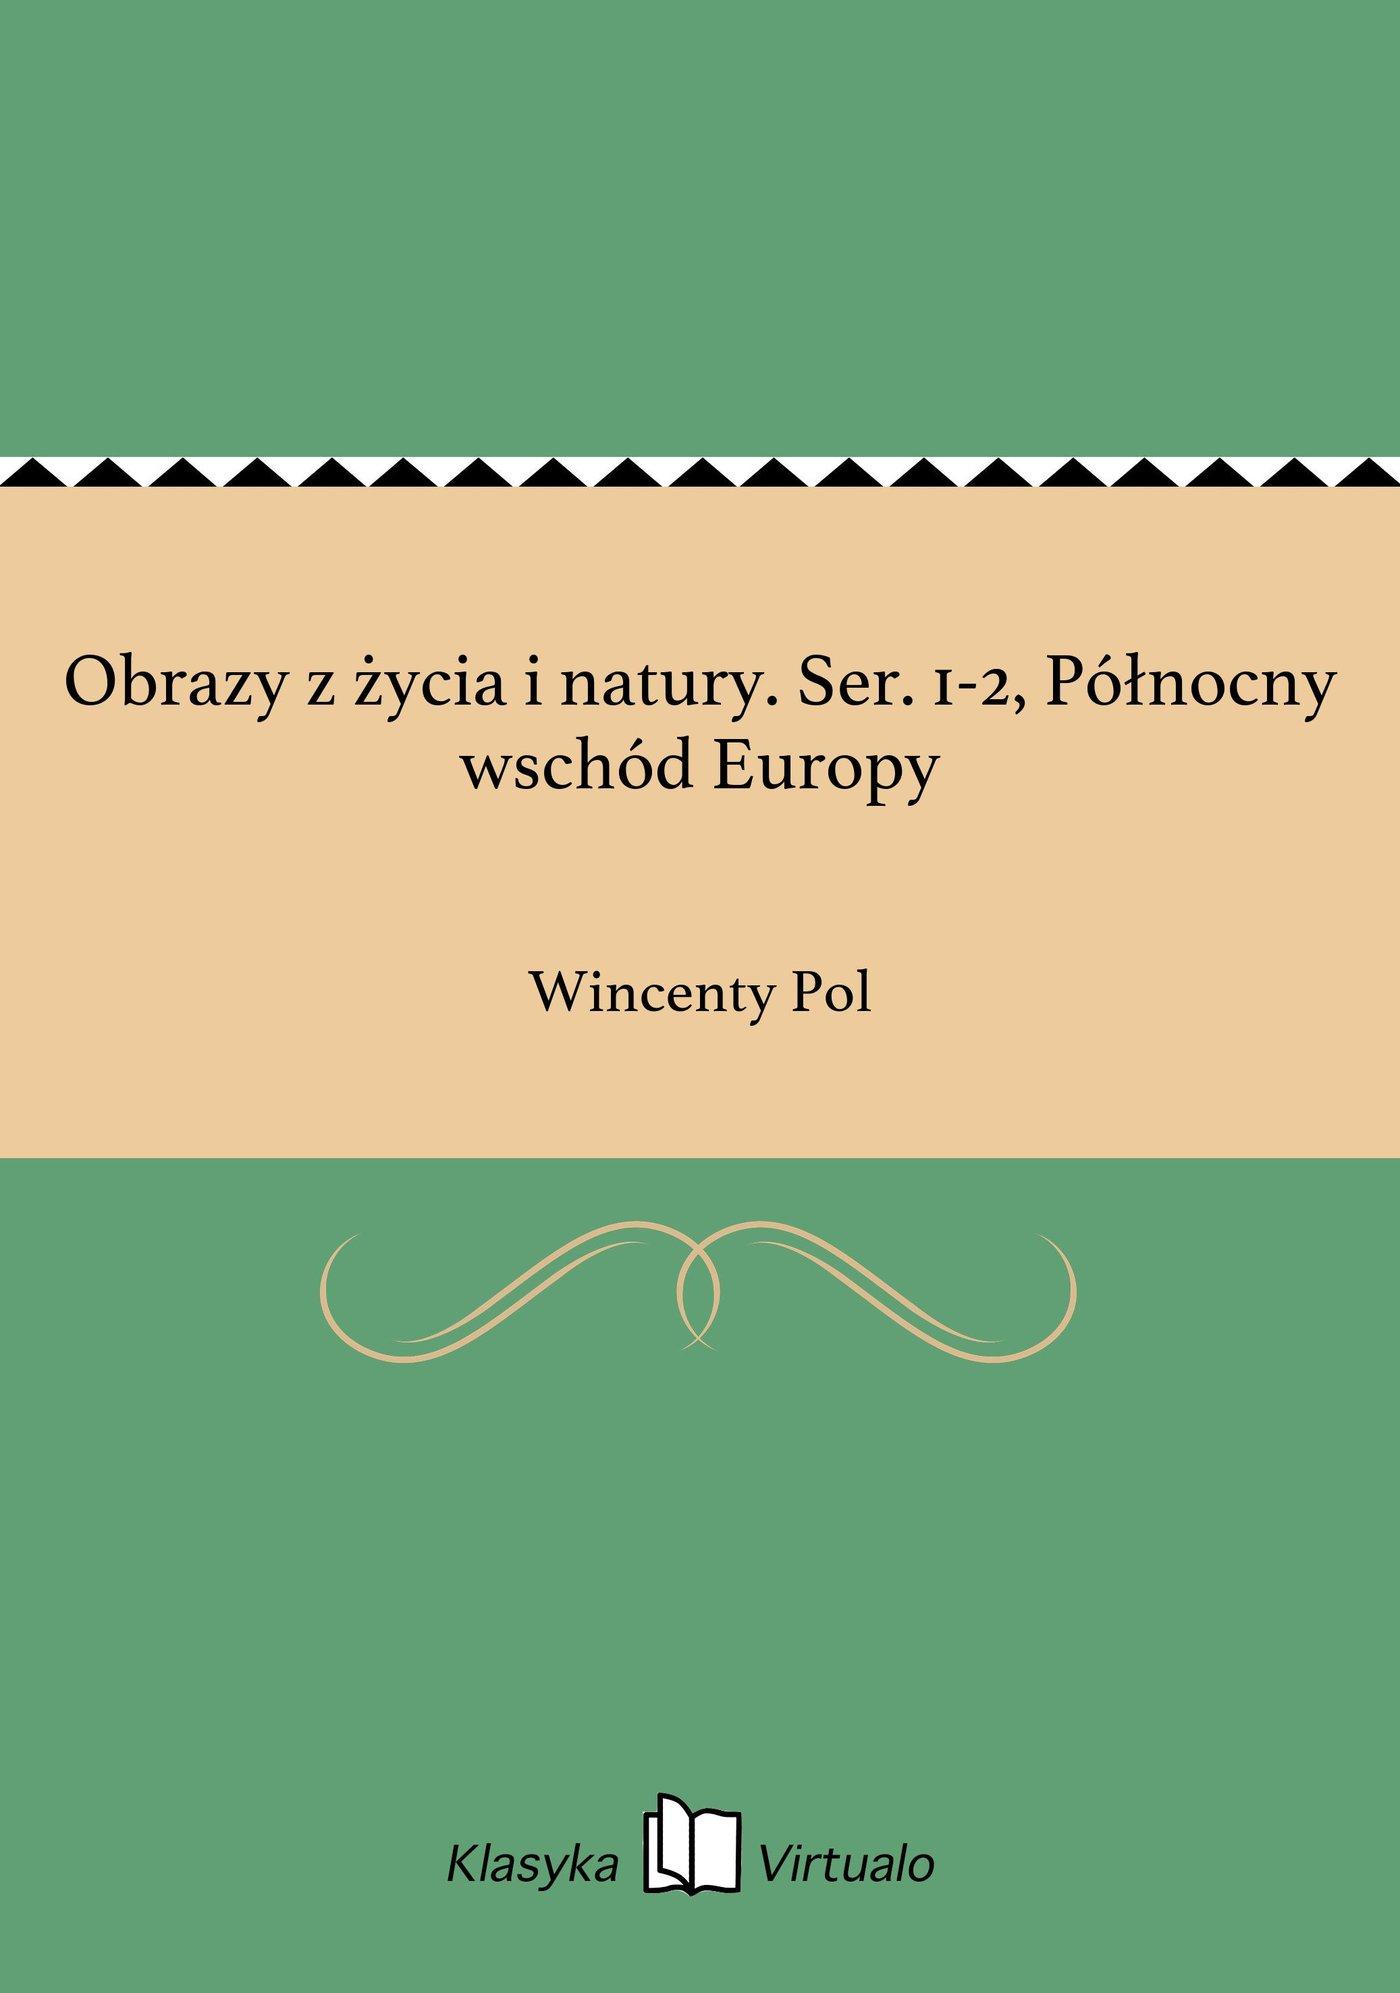 Obrazy z życia i natury. Ser. 1-2, Północny wschód Europy - Ebook (Książka EPUB) do pobrania w formacie EPUB